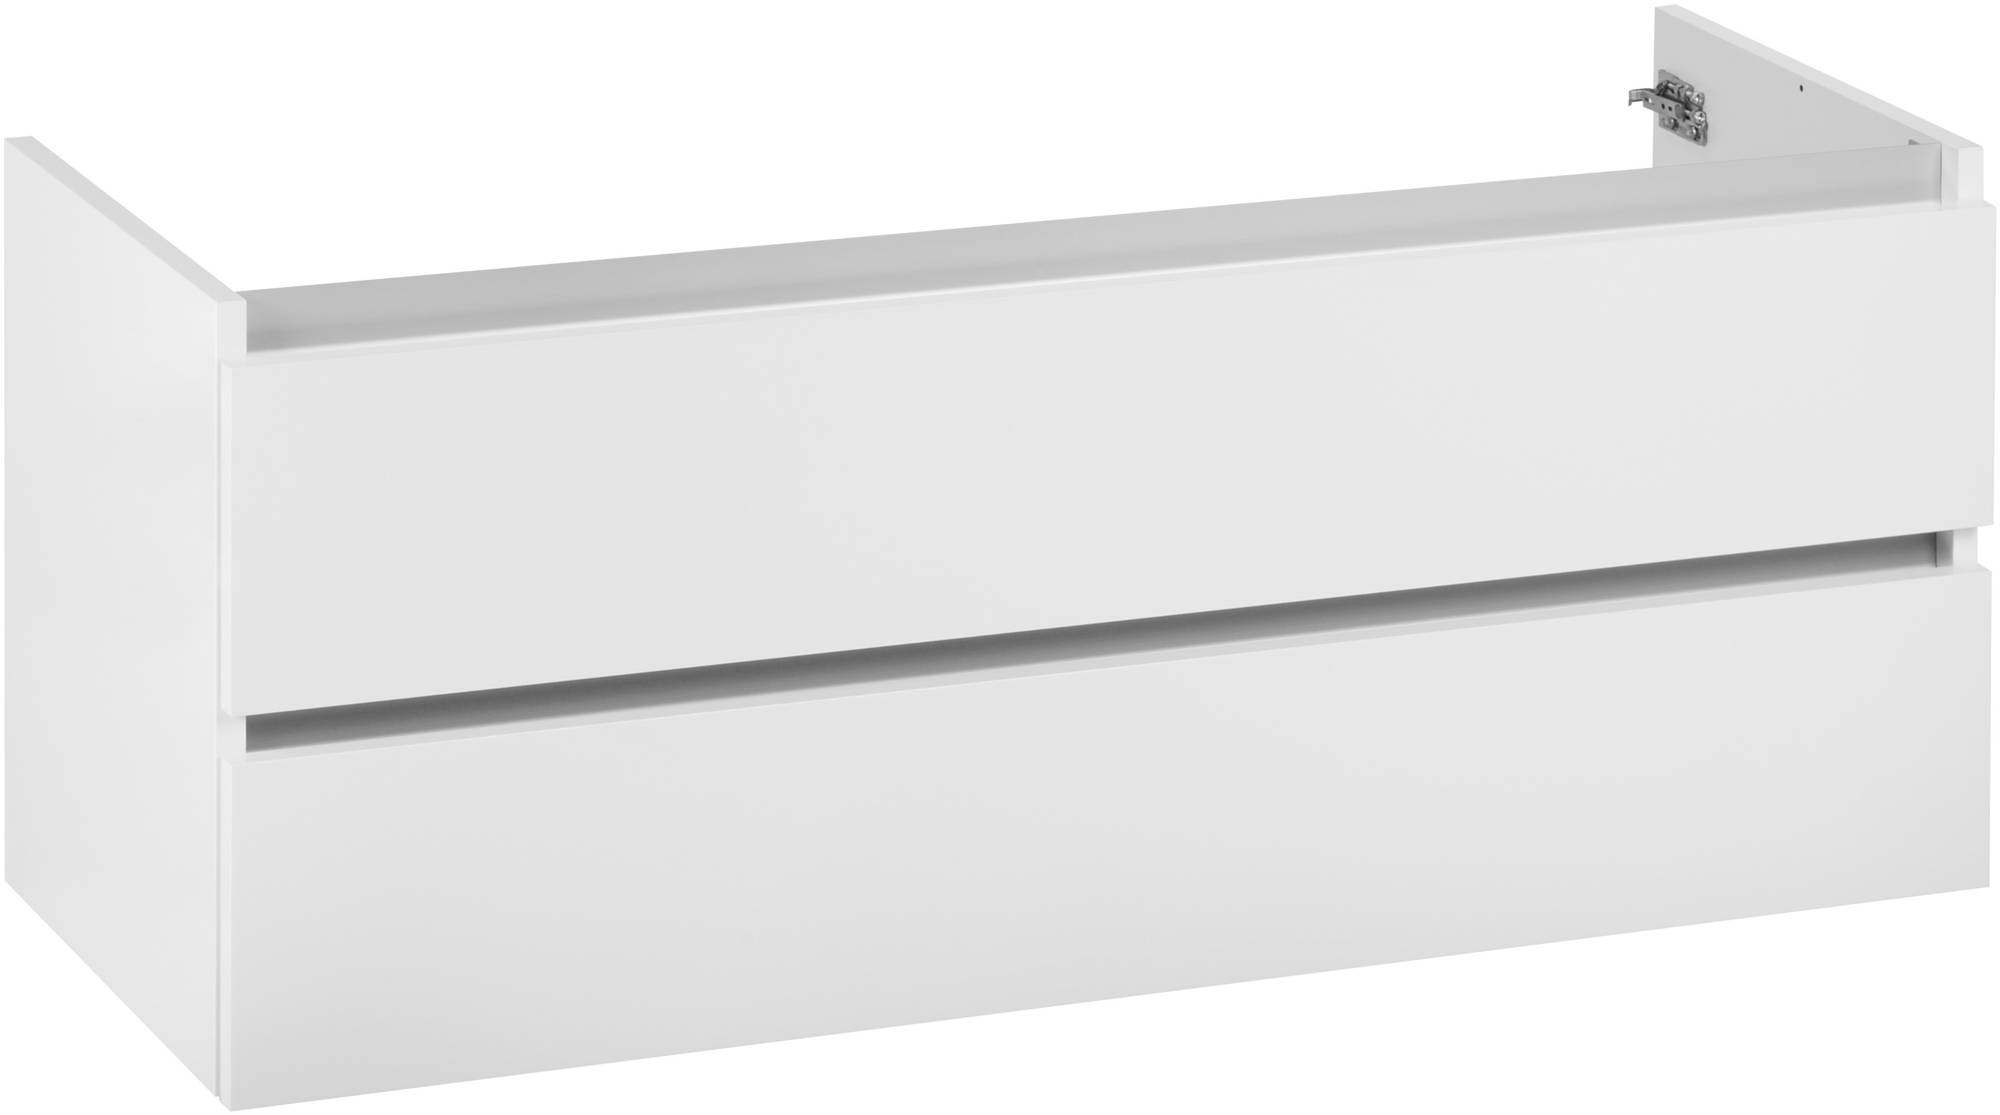 Ben Limara Wastafelonderkast 140x44,5x50cm Glans Wit/Aluminium